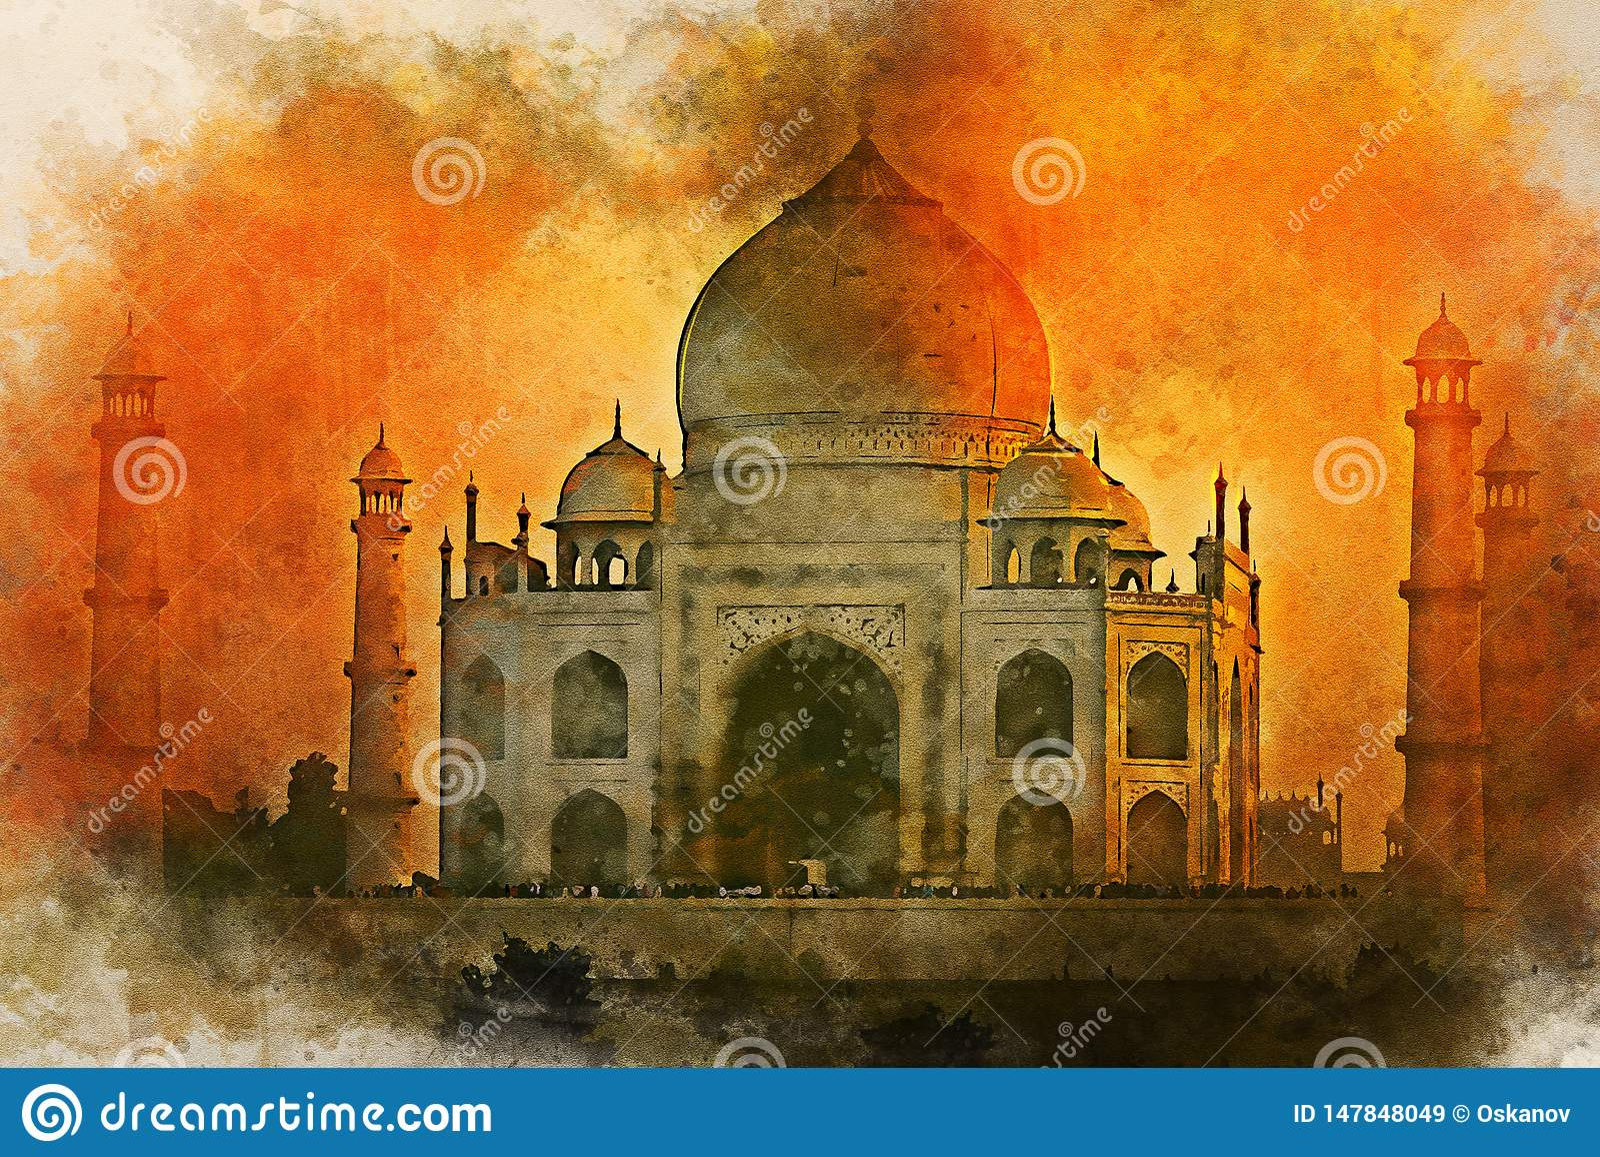 Watercolor painting of Taj Mahal scenic sunset view in Agra, India.